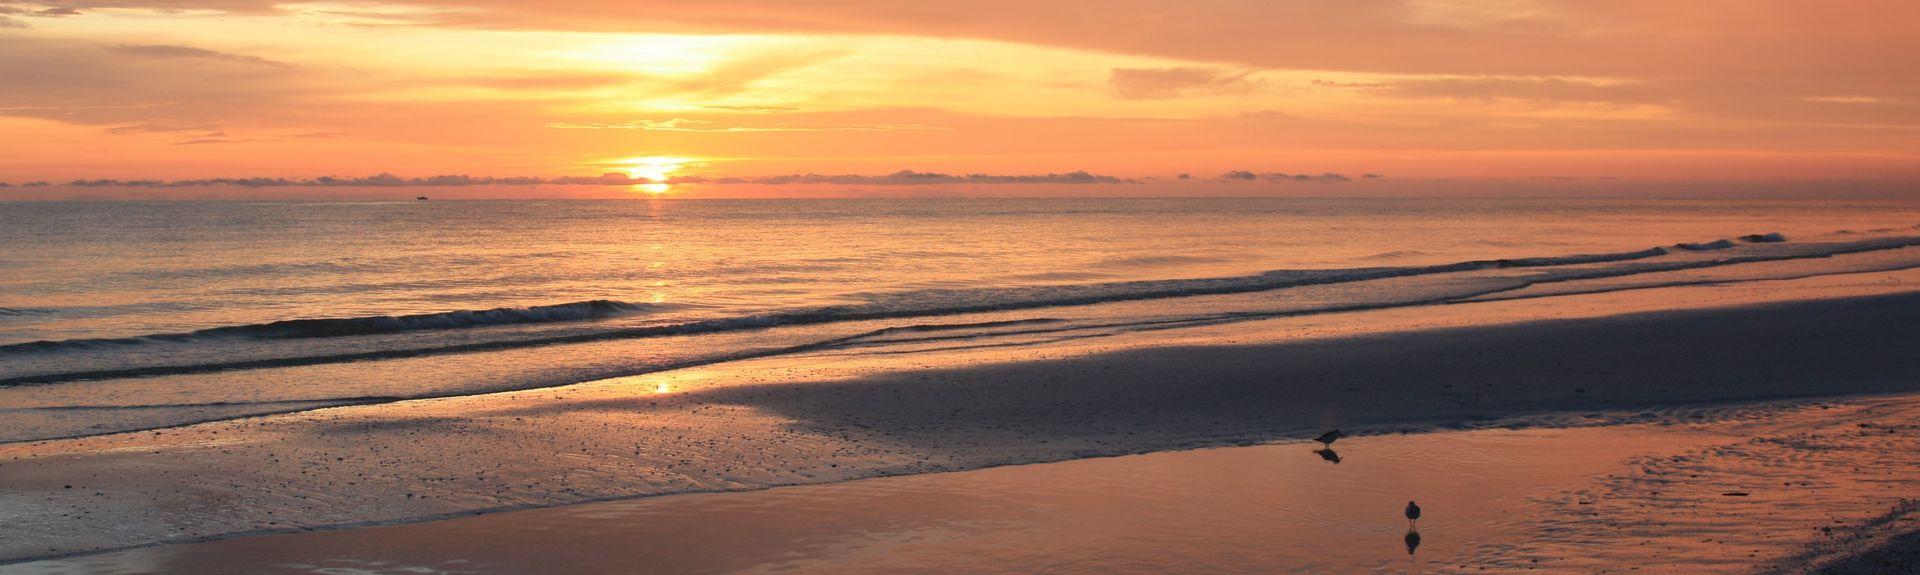 Marco Island, FL, USA